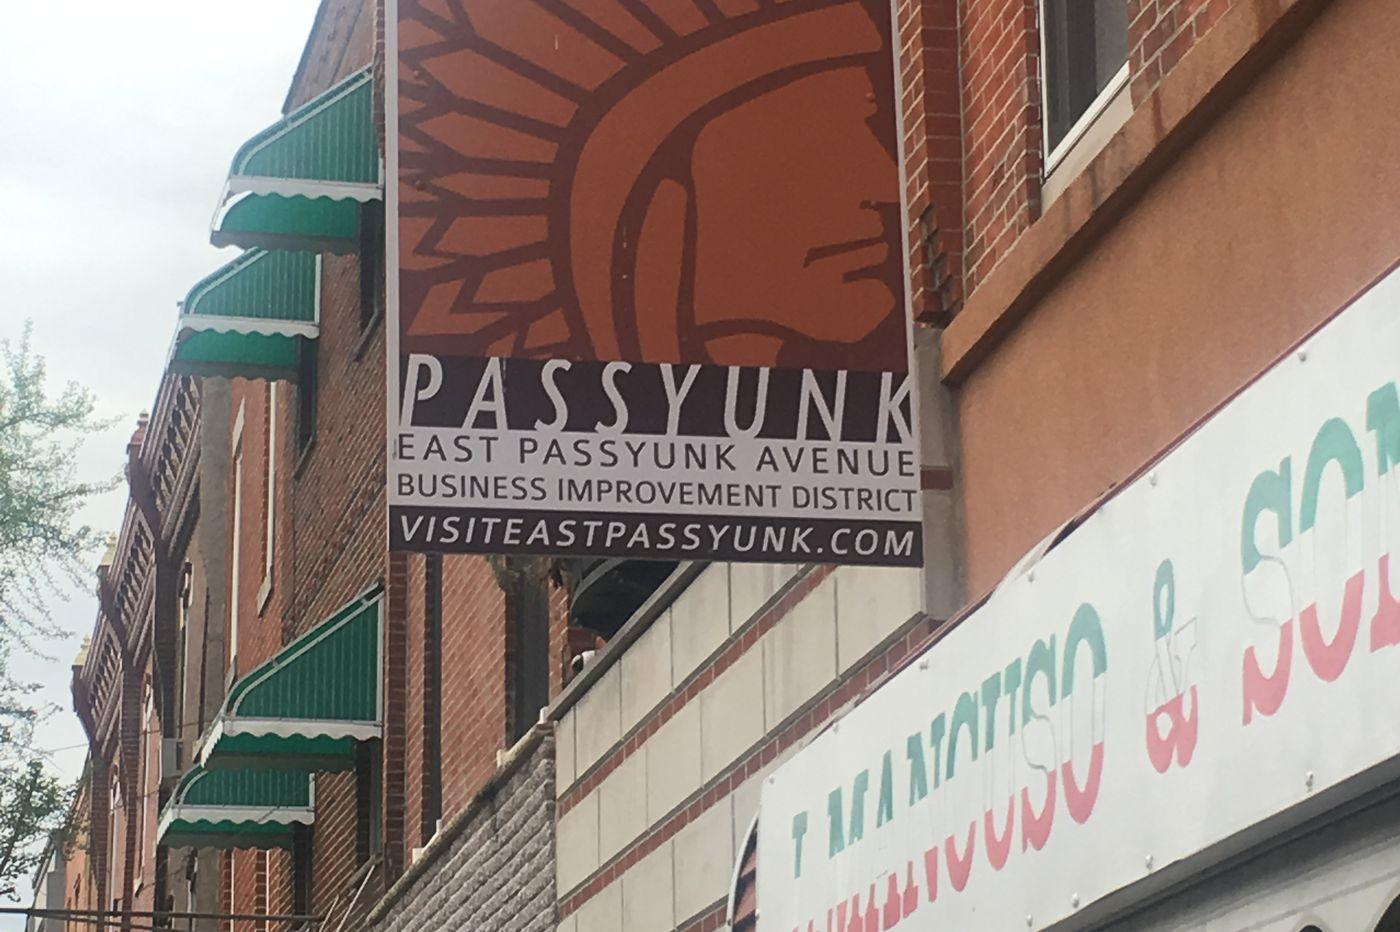 How the East Passyunk logo misrepresents Philadelphia's past | Opinion